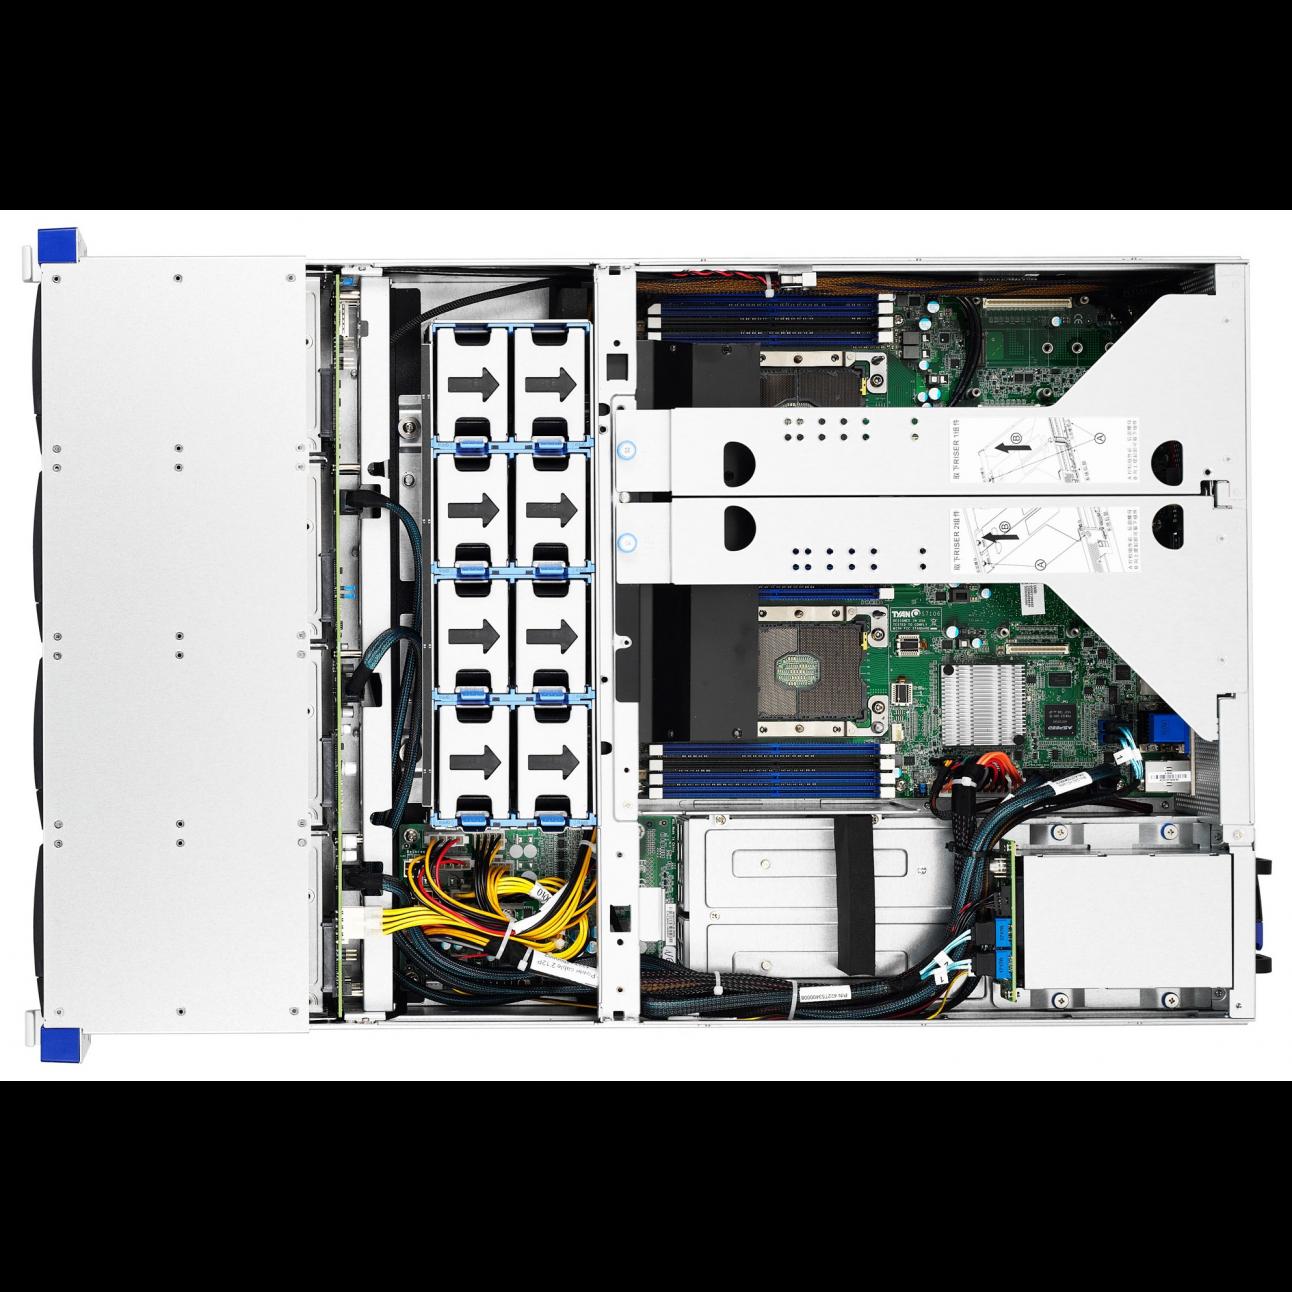 Серверная платформа Tyan Thunder SX B7106T70EV12HR, 2U, Scalable, DDR4, 12xHDD, резервируемый БП